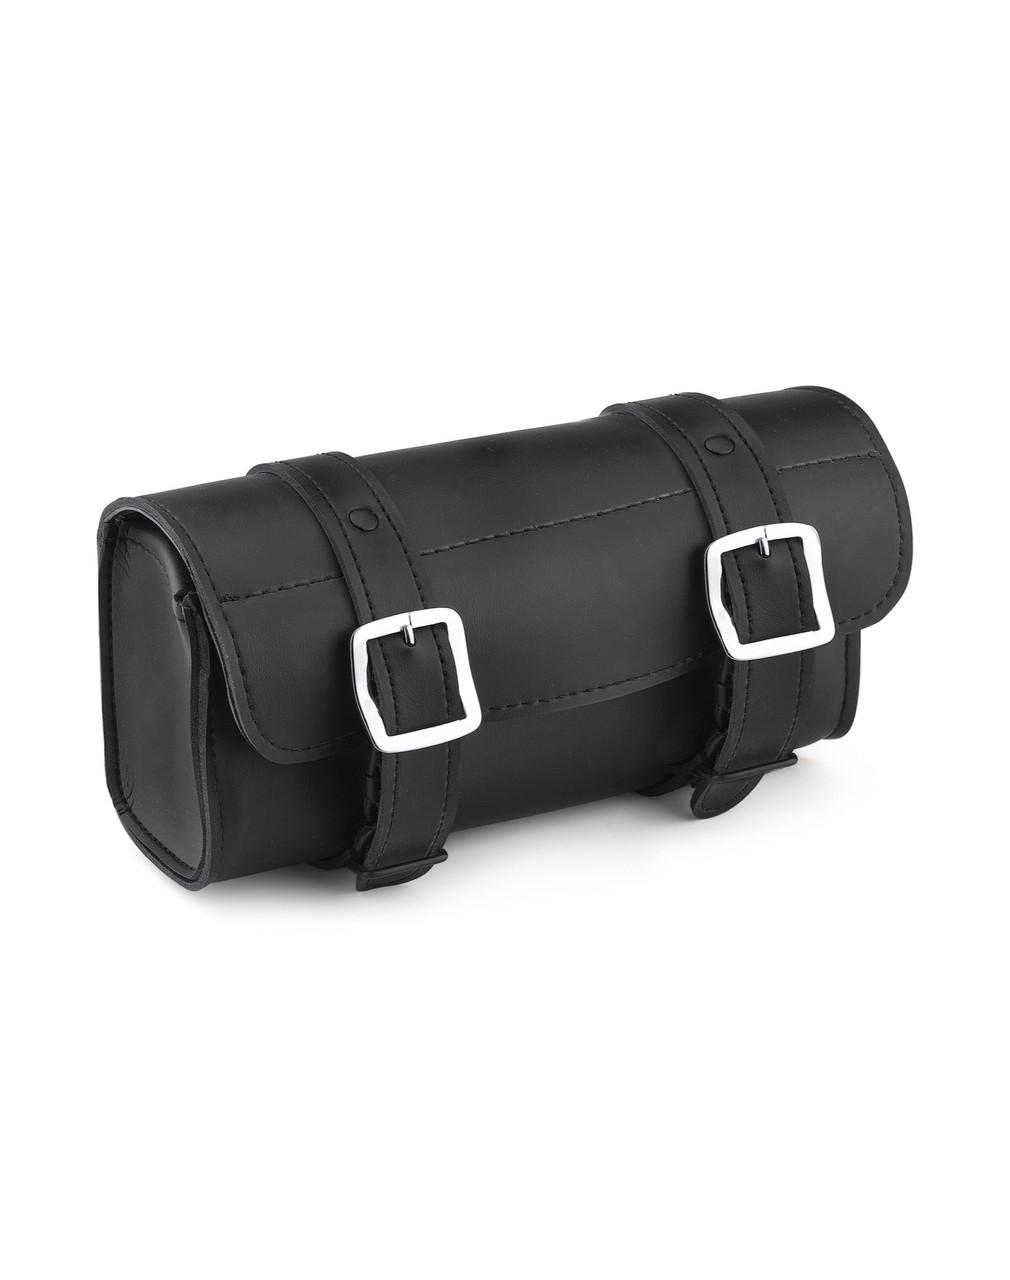 VikingBags Armor Plain Motorcycle Tool Bag